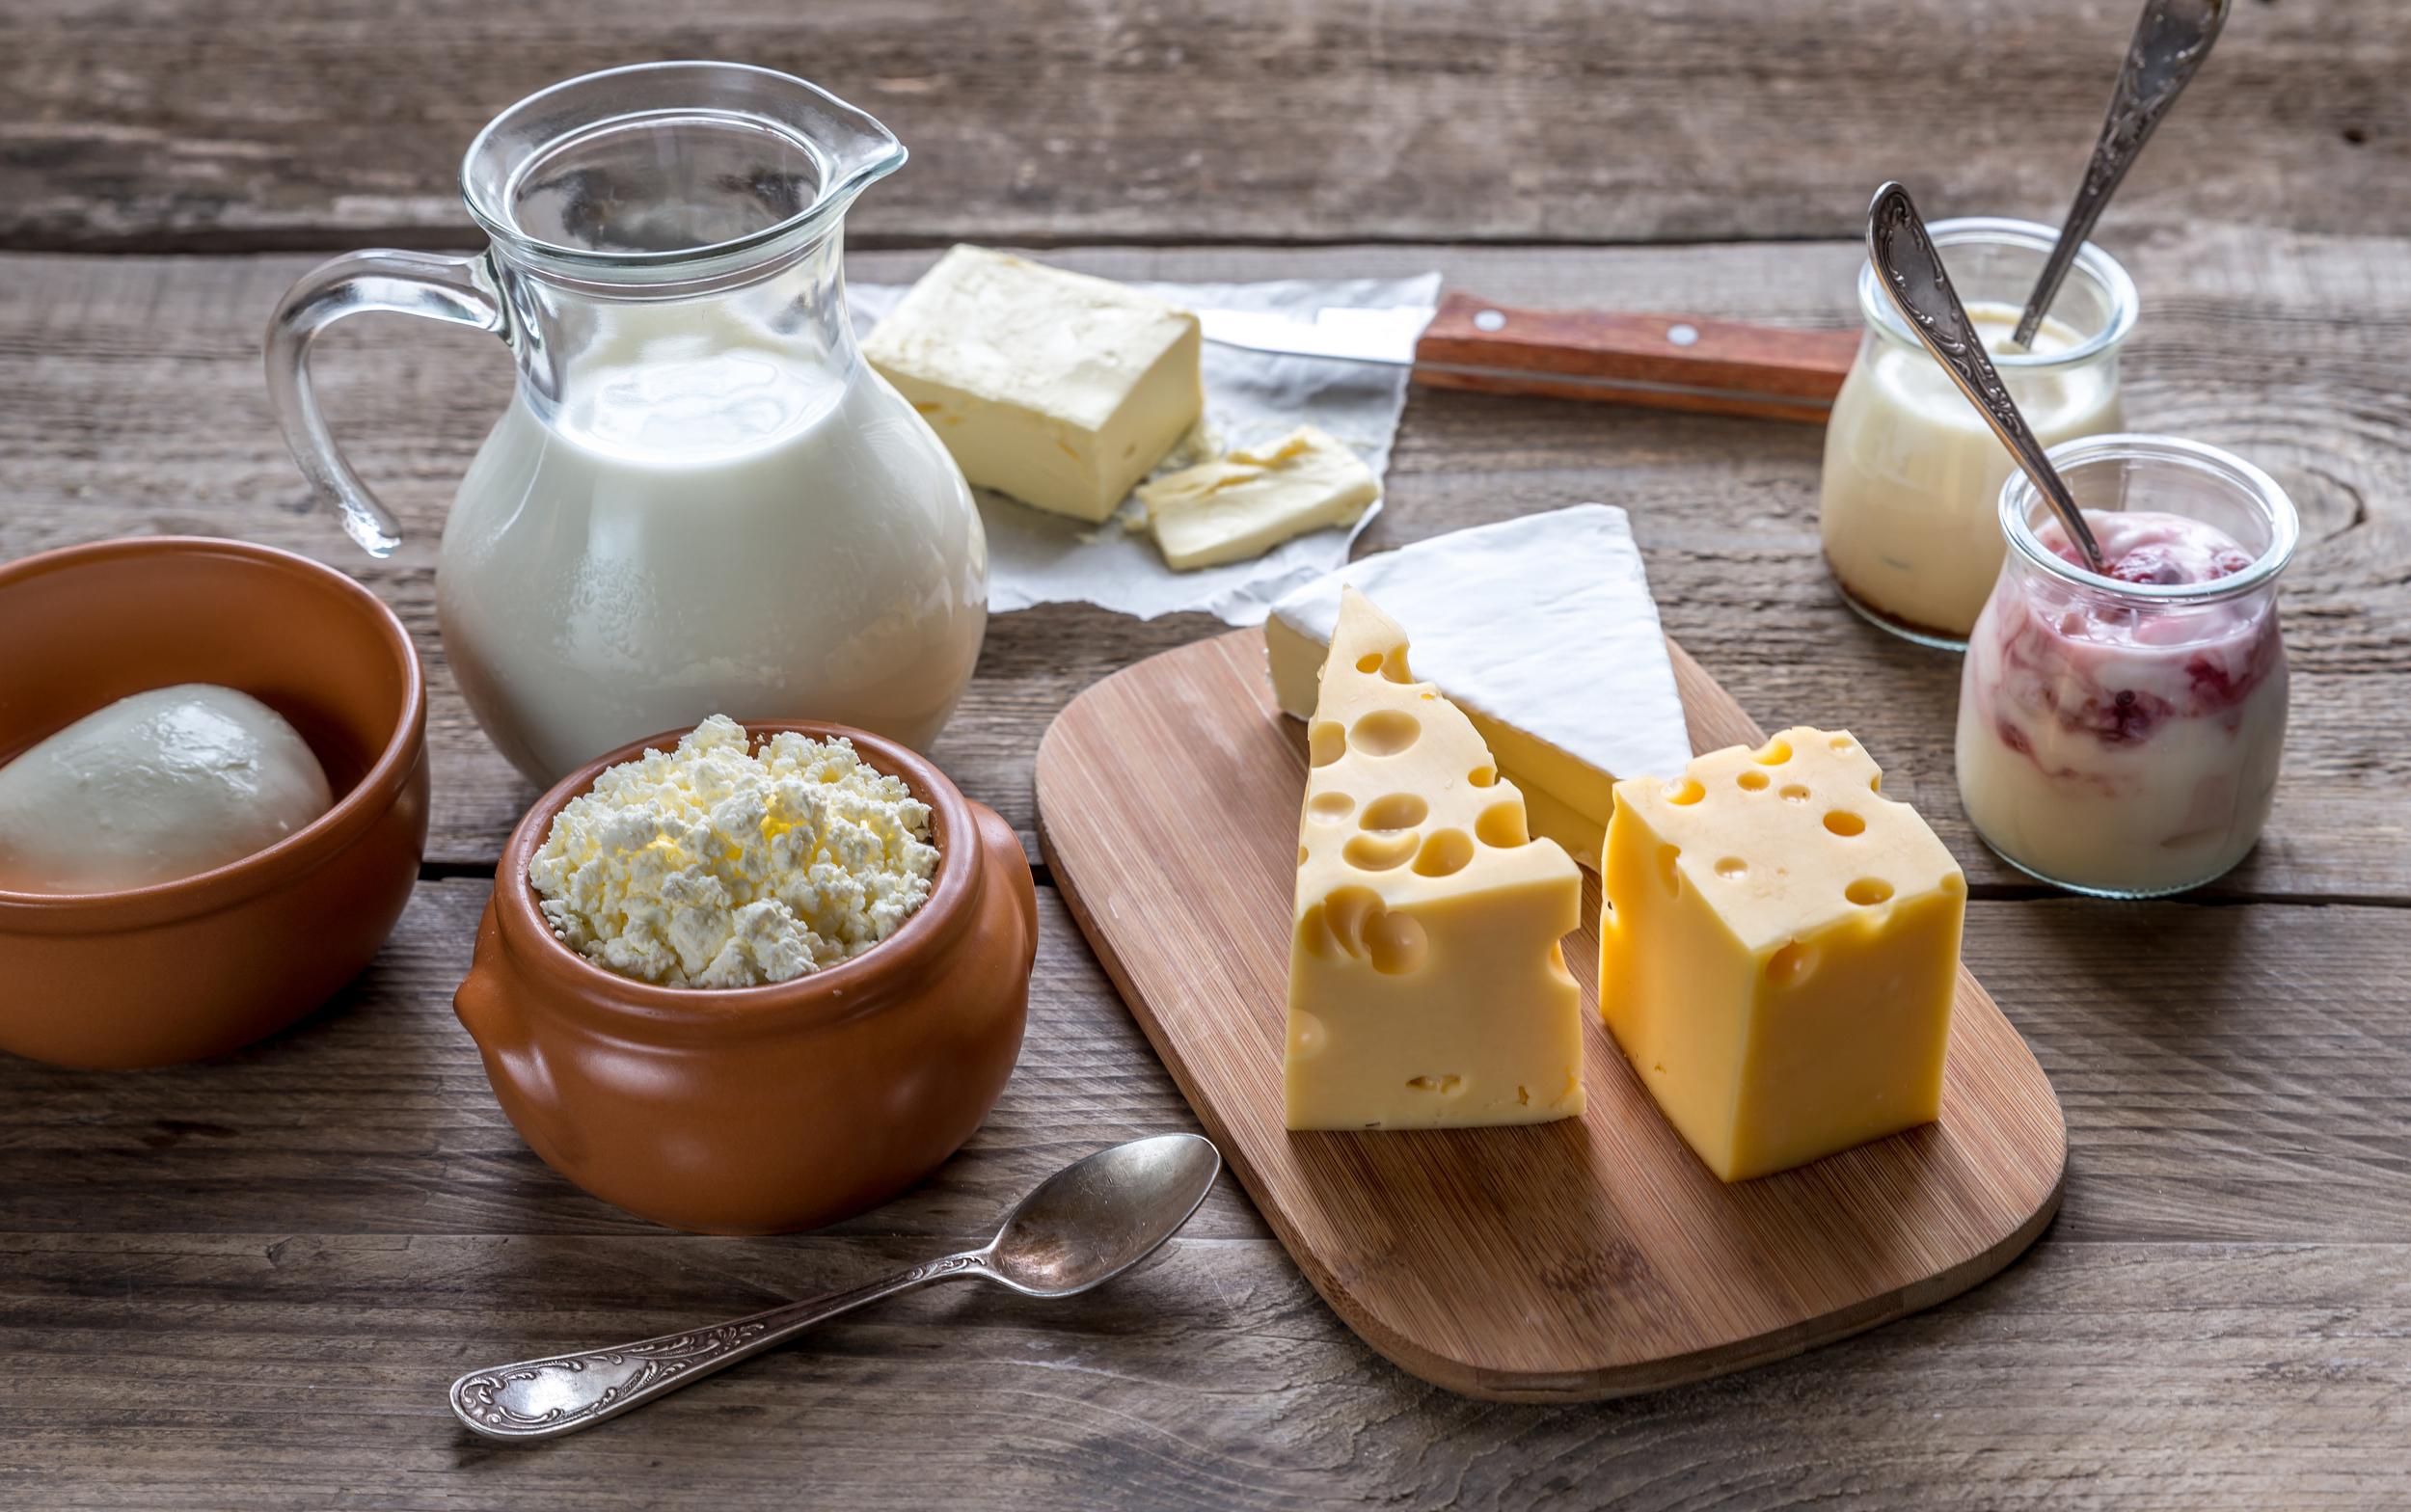 bigstock-Various-Types-Of-Dairy-Product-81943604.jpg